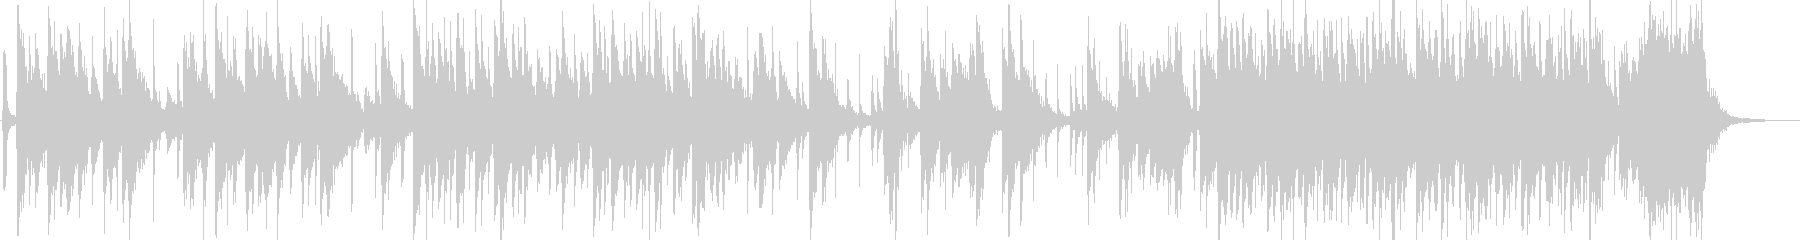 日本伝統音楽5(和太鼓)の未再生の波形